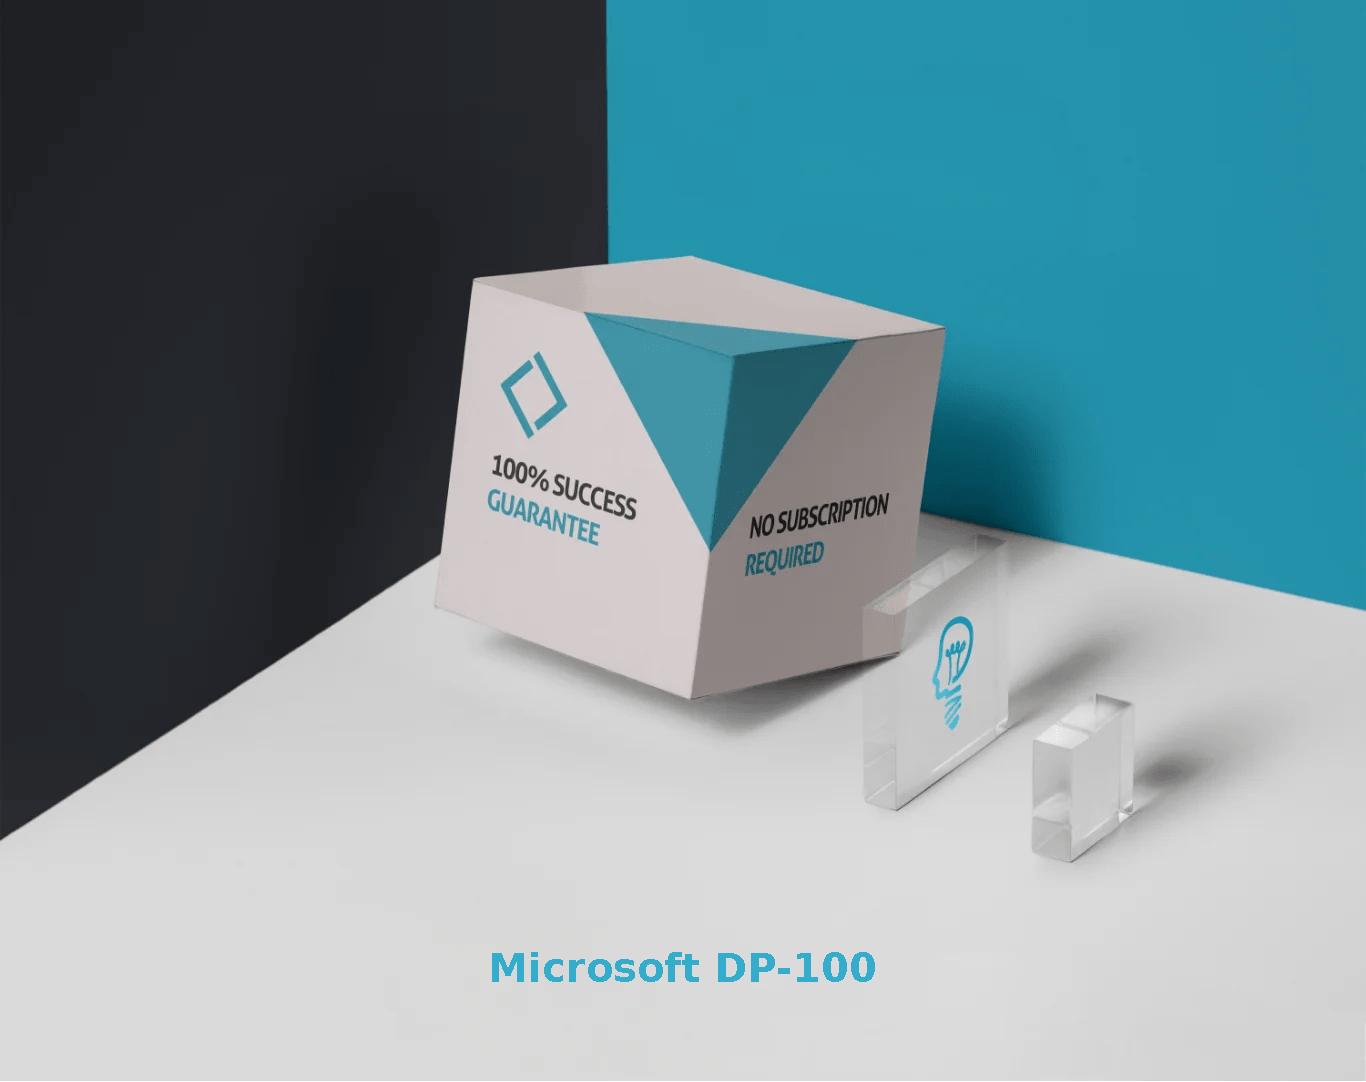 Microsoft DP-100 Exams